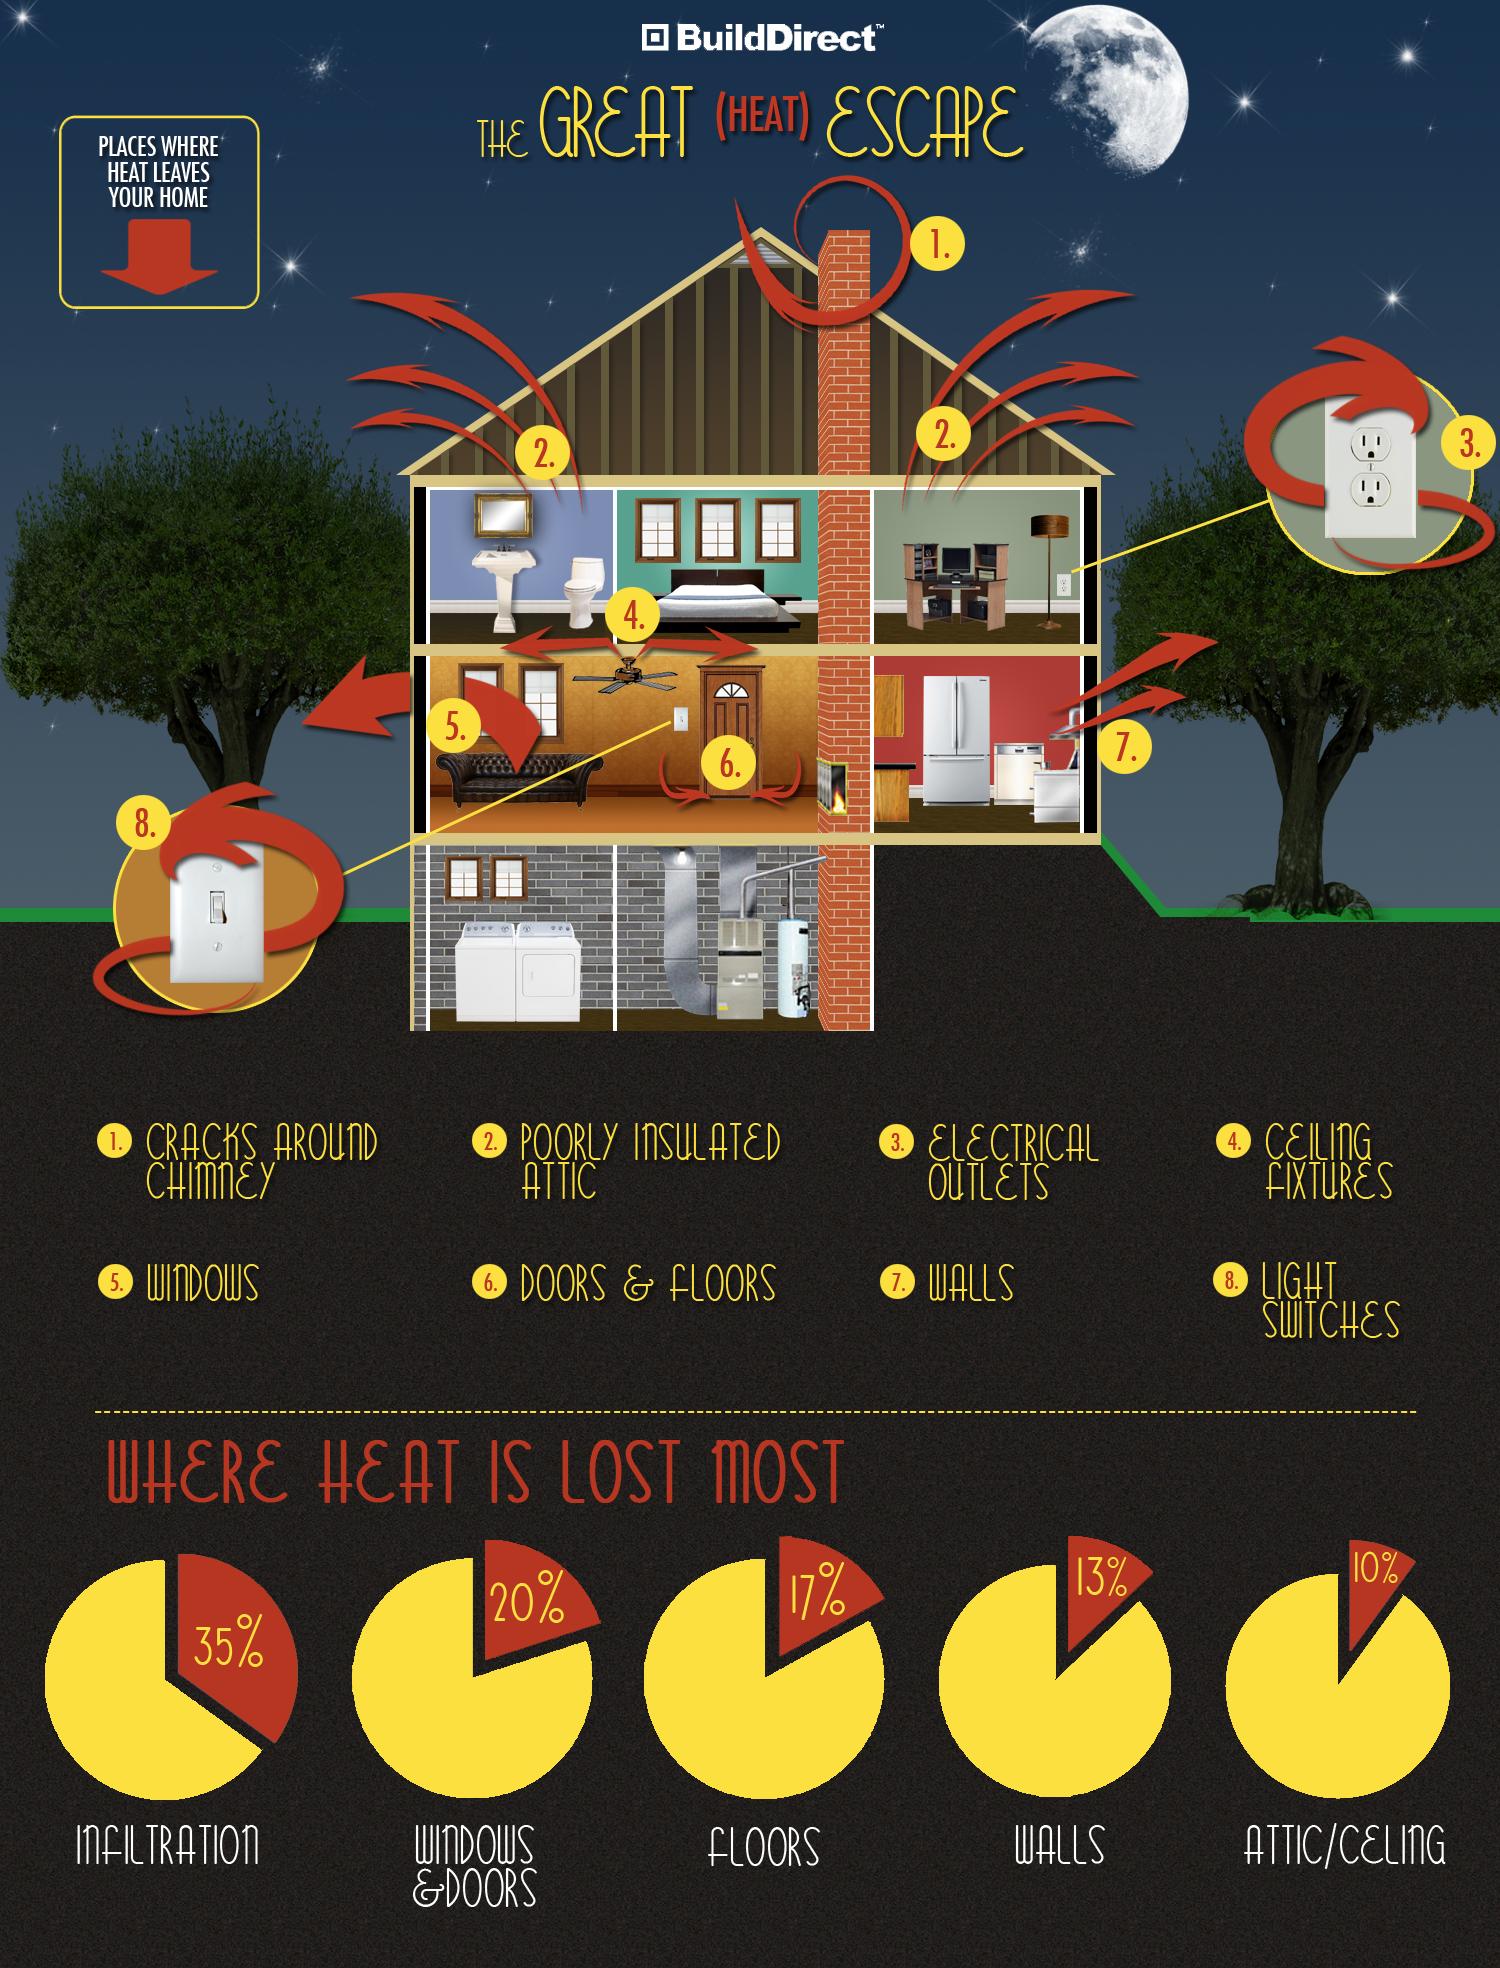 Energy In Efficiency The Great Heat Escape